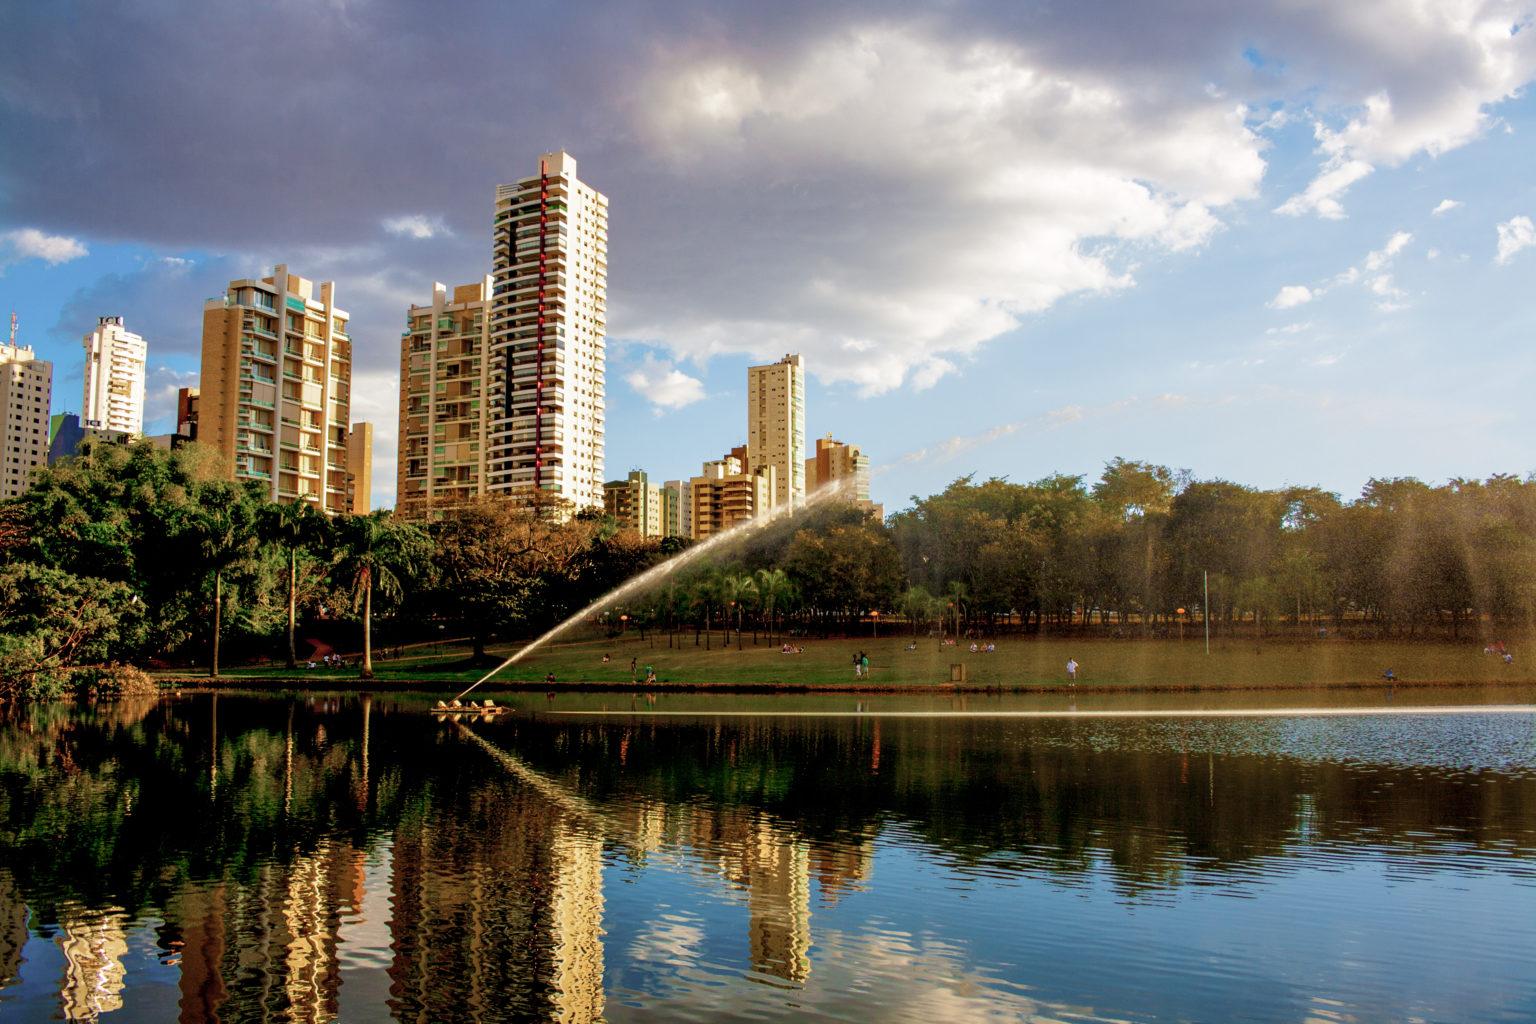 Walking tour in Goiânia